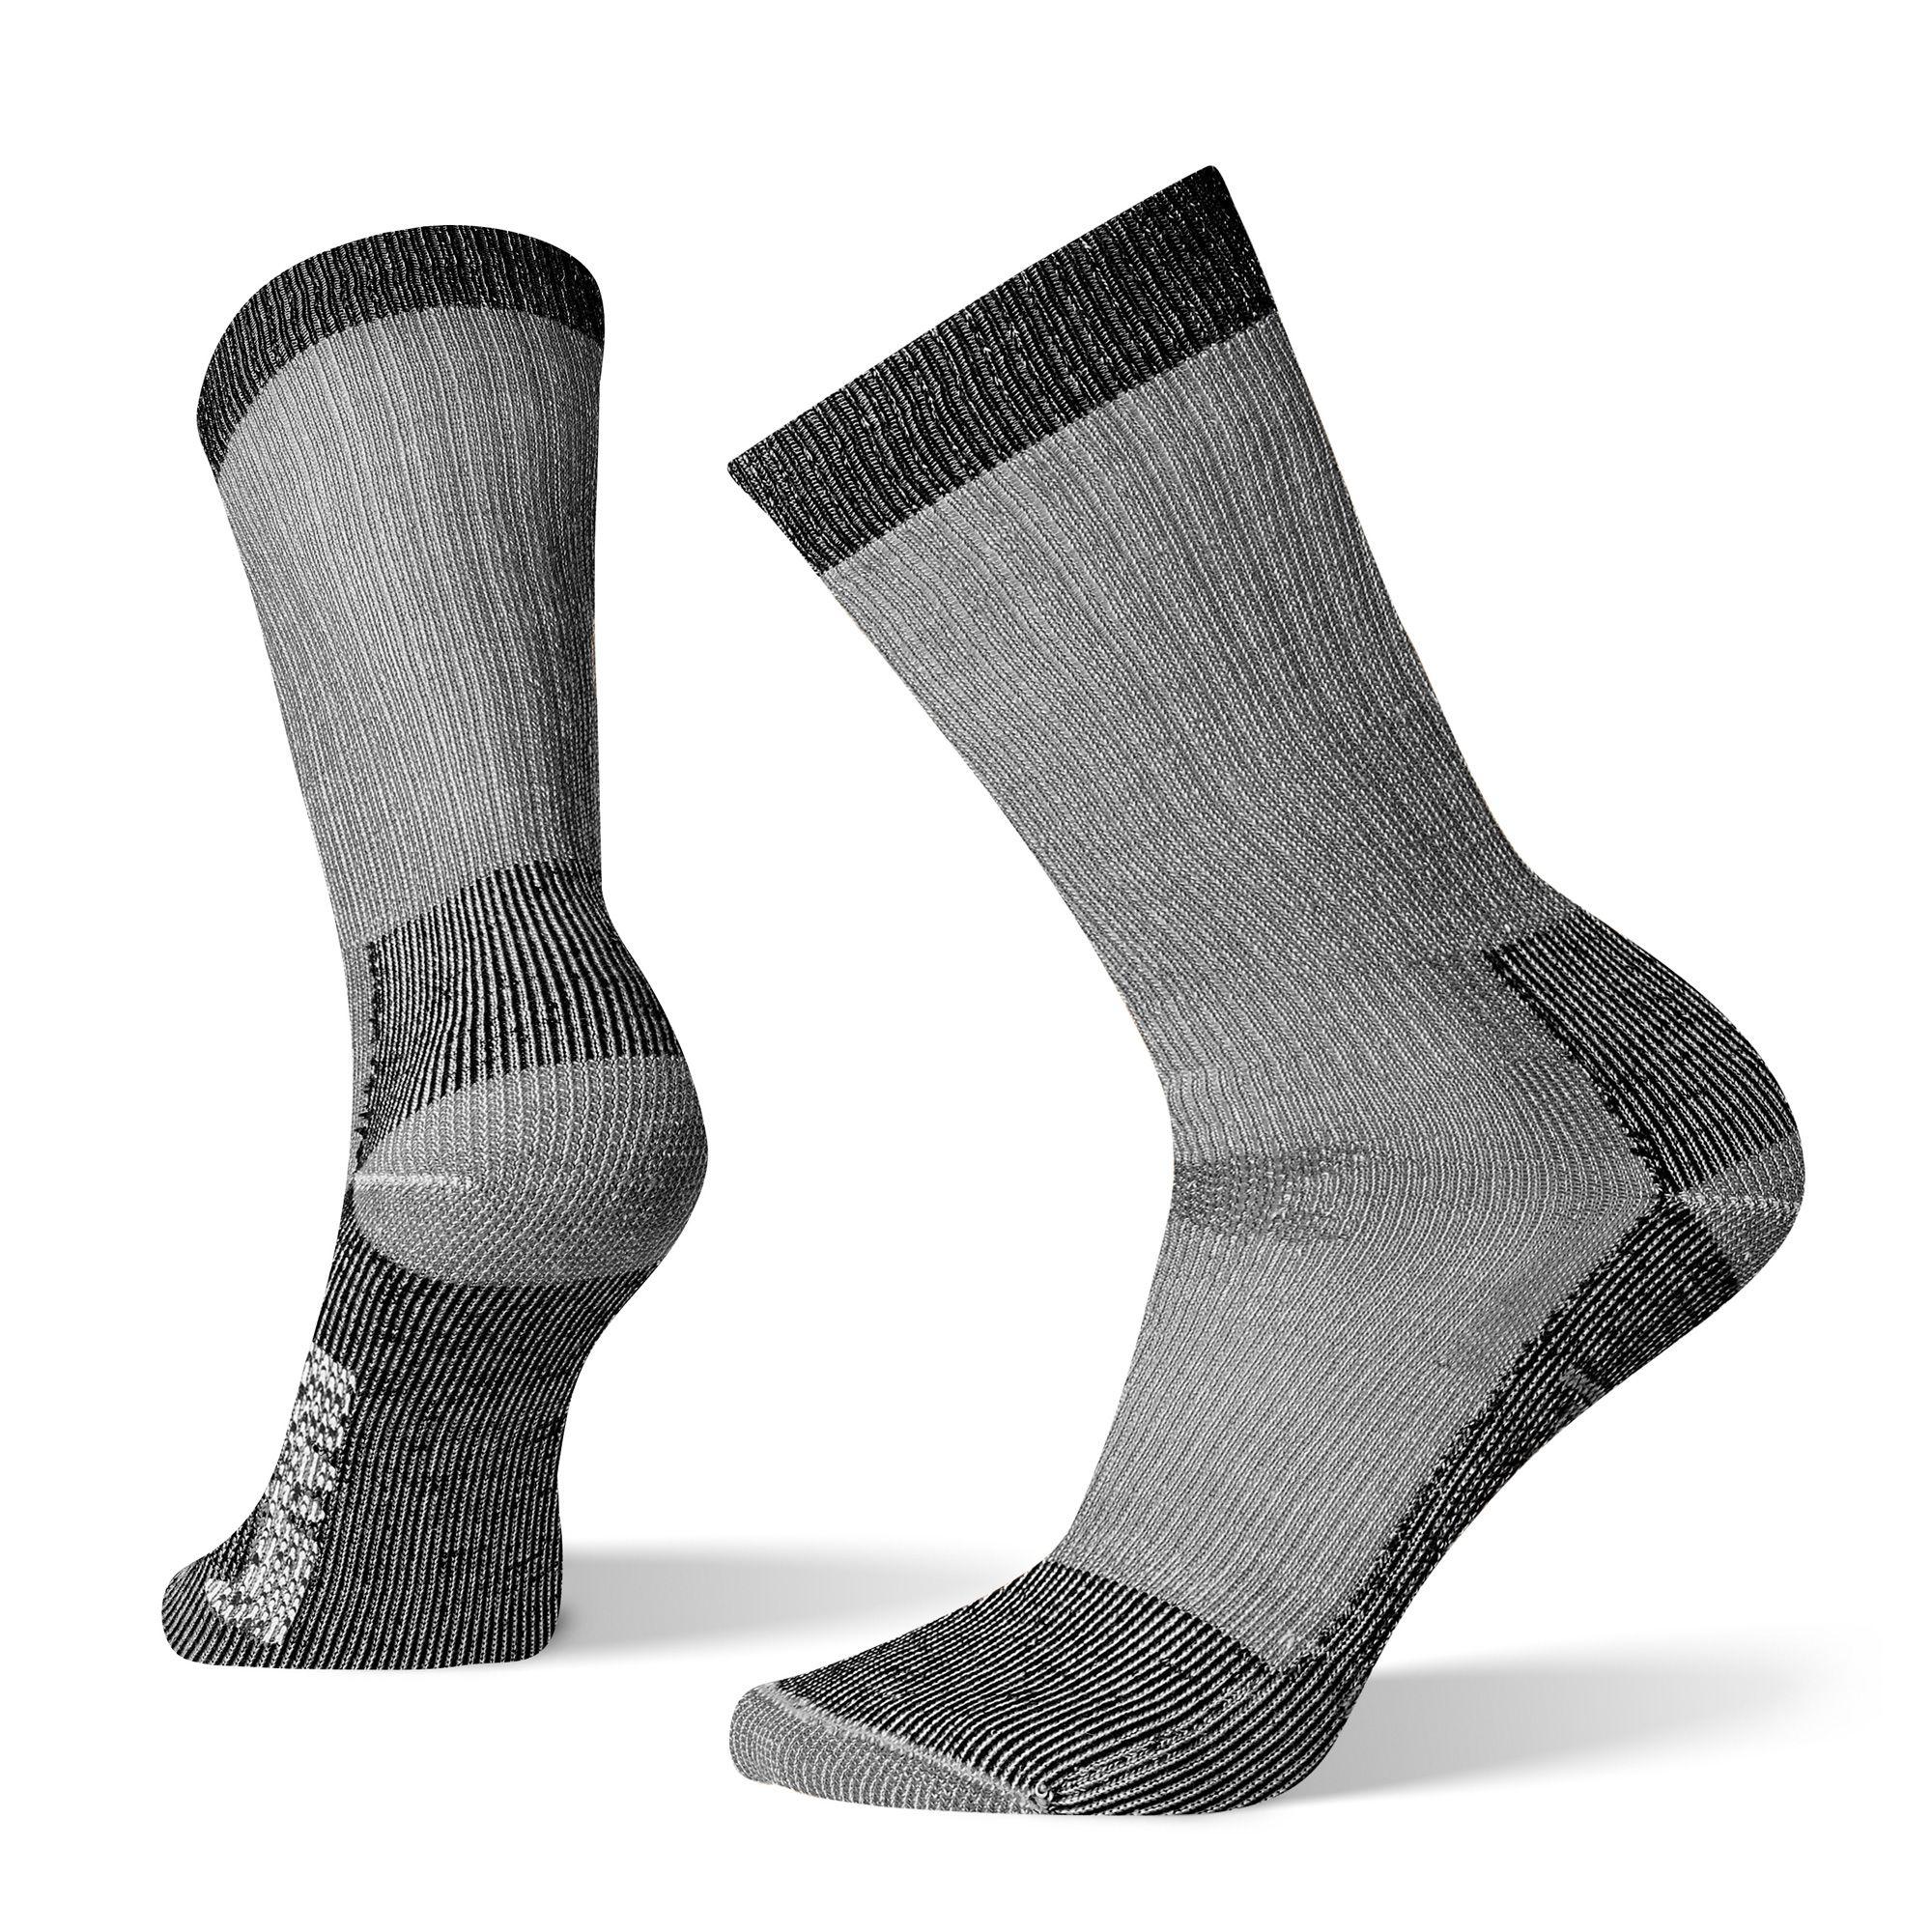 Work Extra Cushion Tall Crew Socks